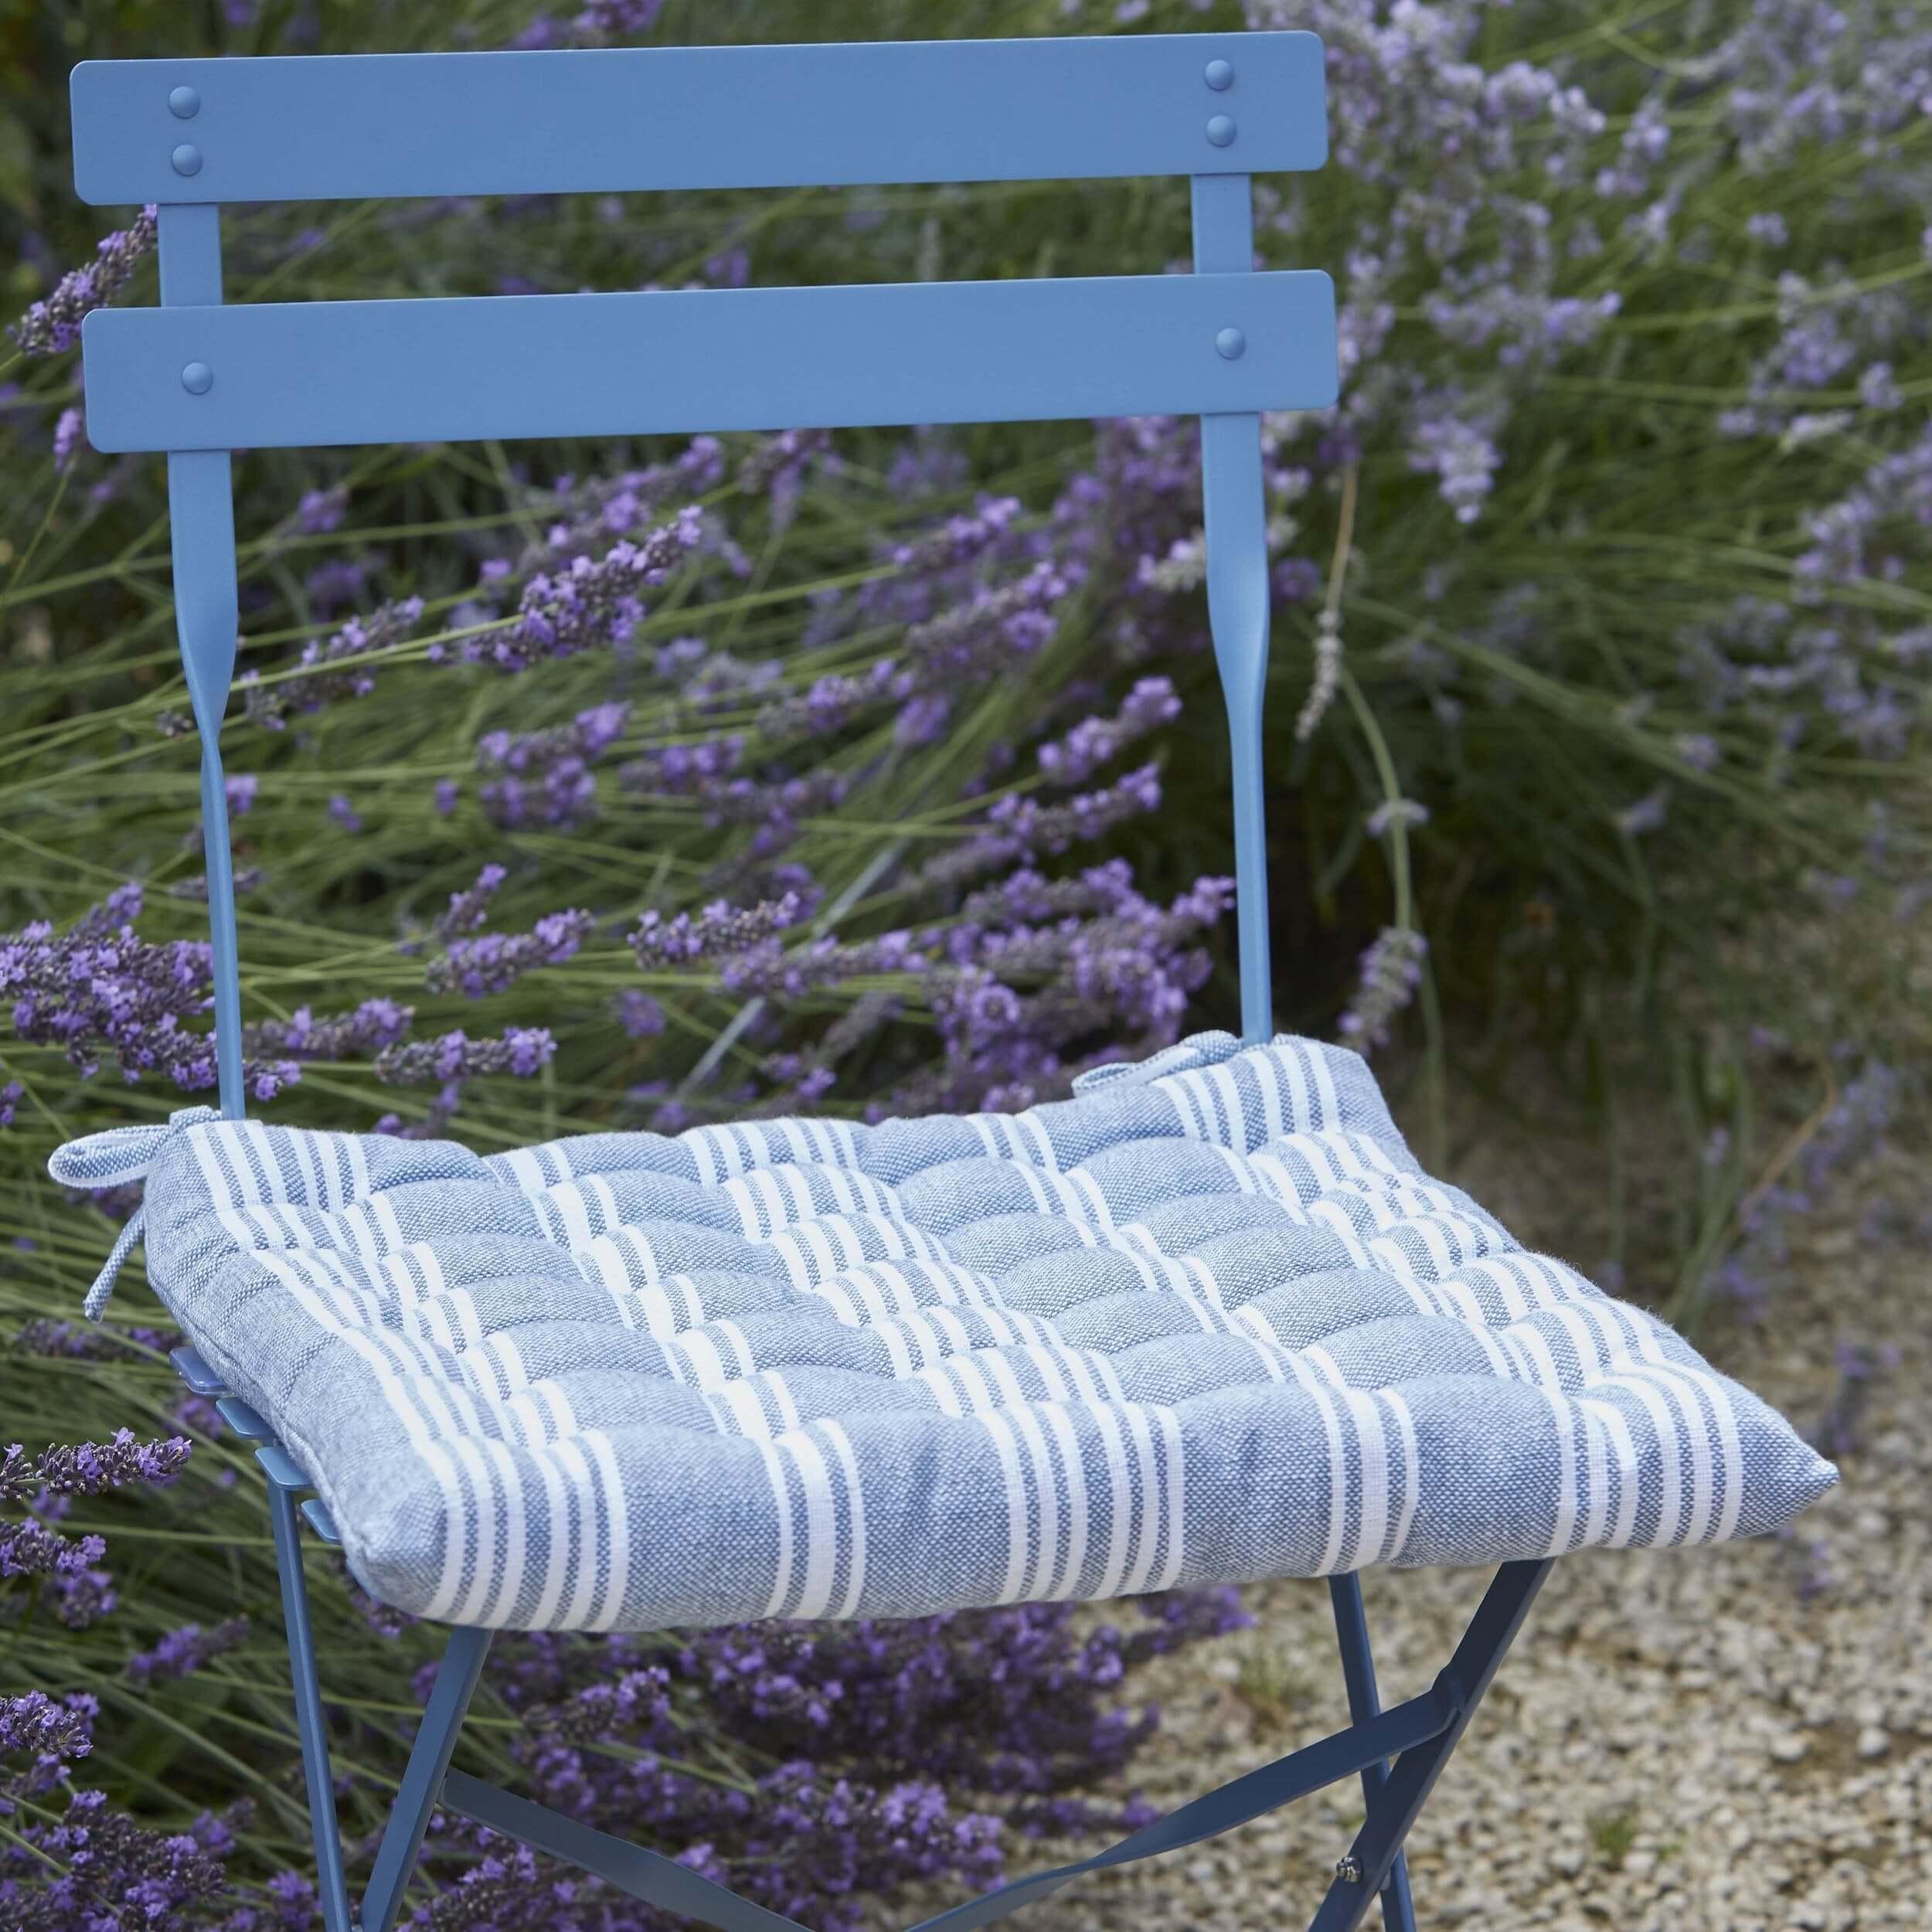 Striped Seat Pad - save 20%